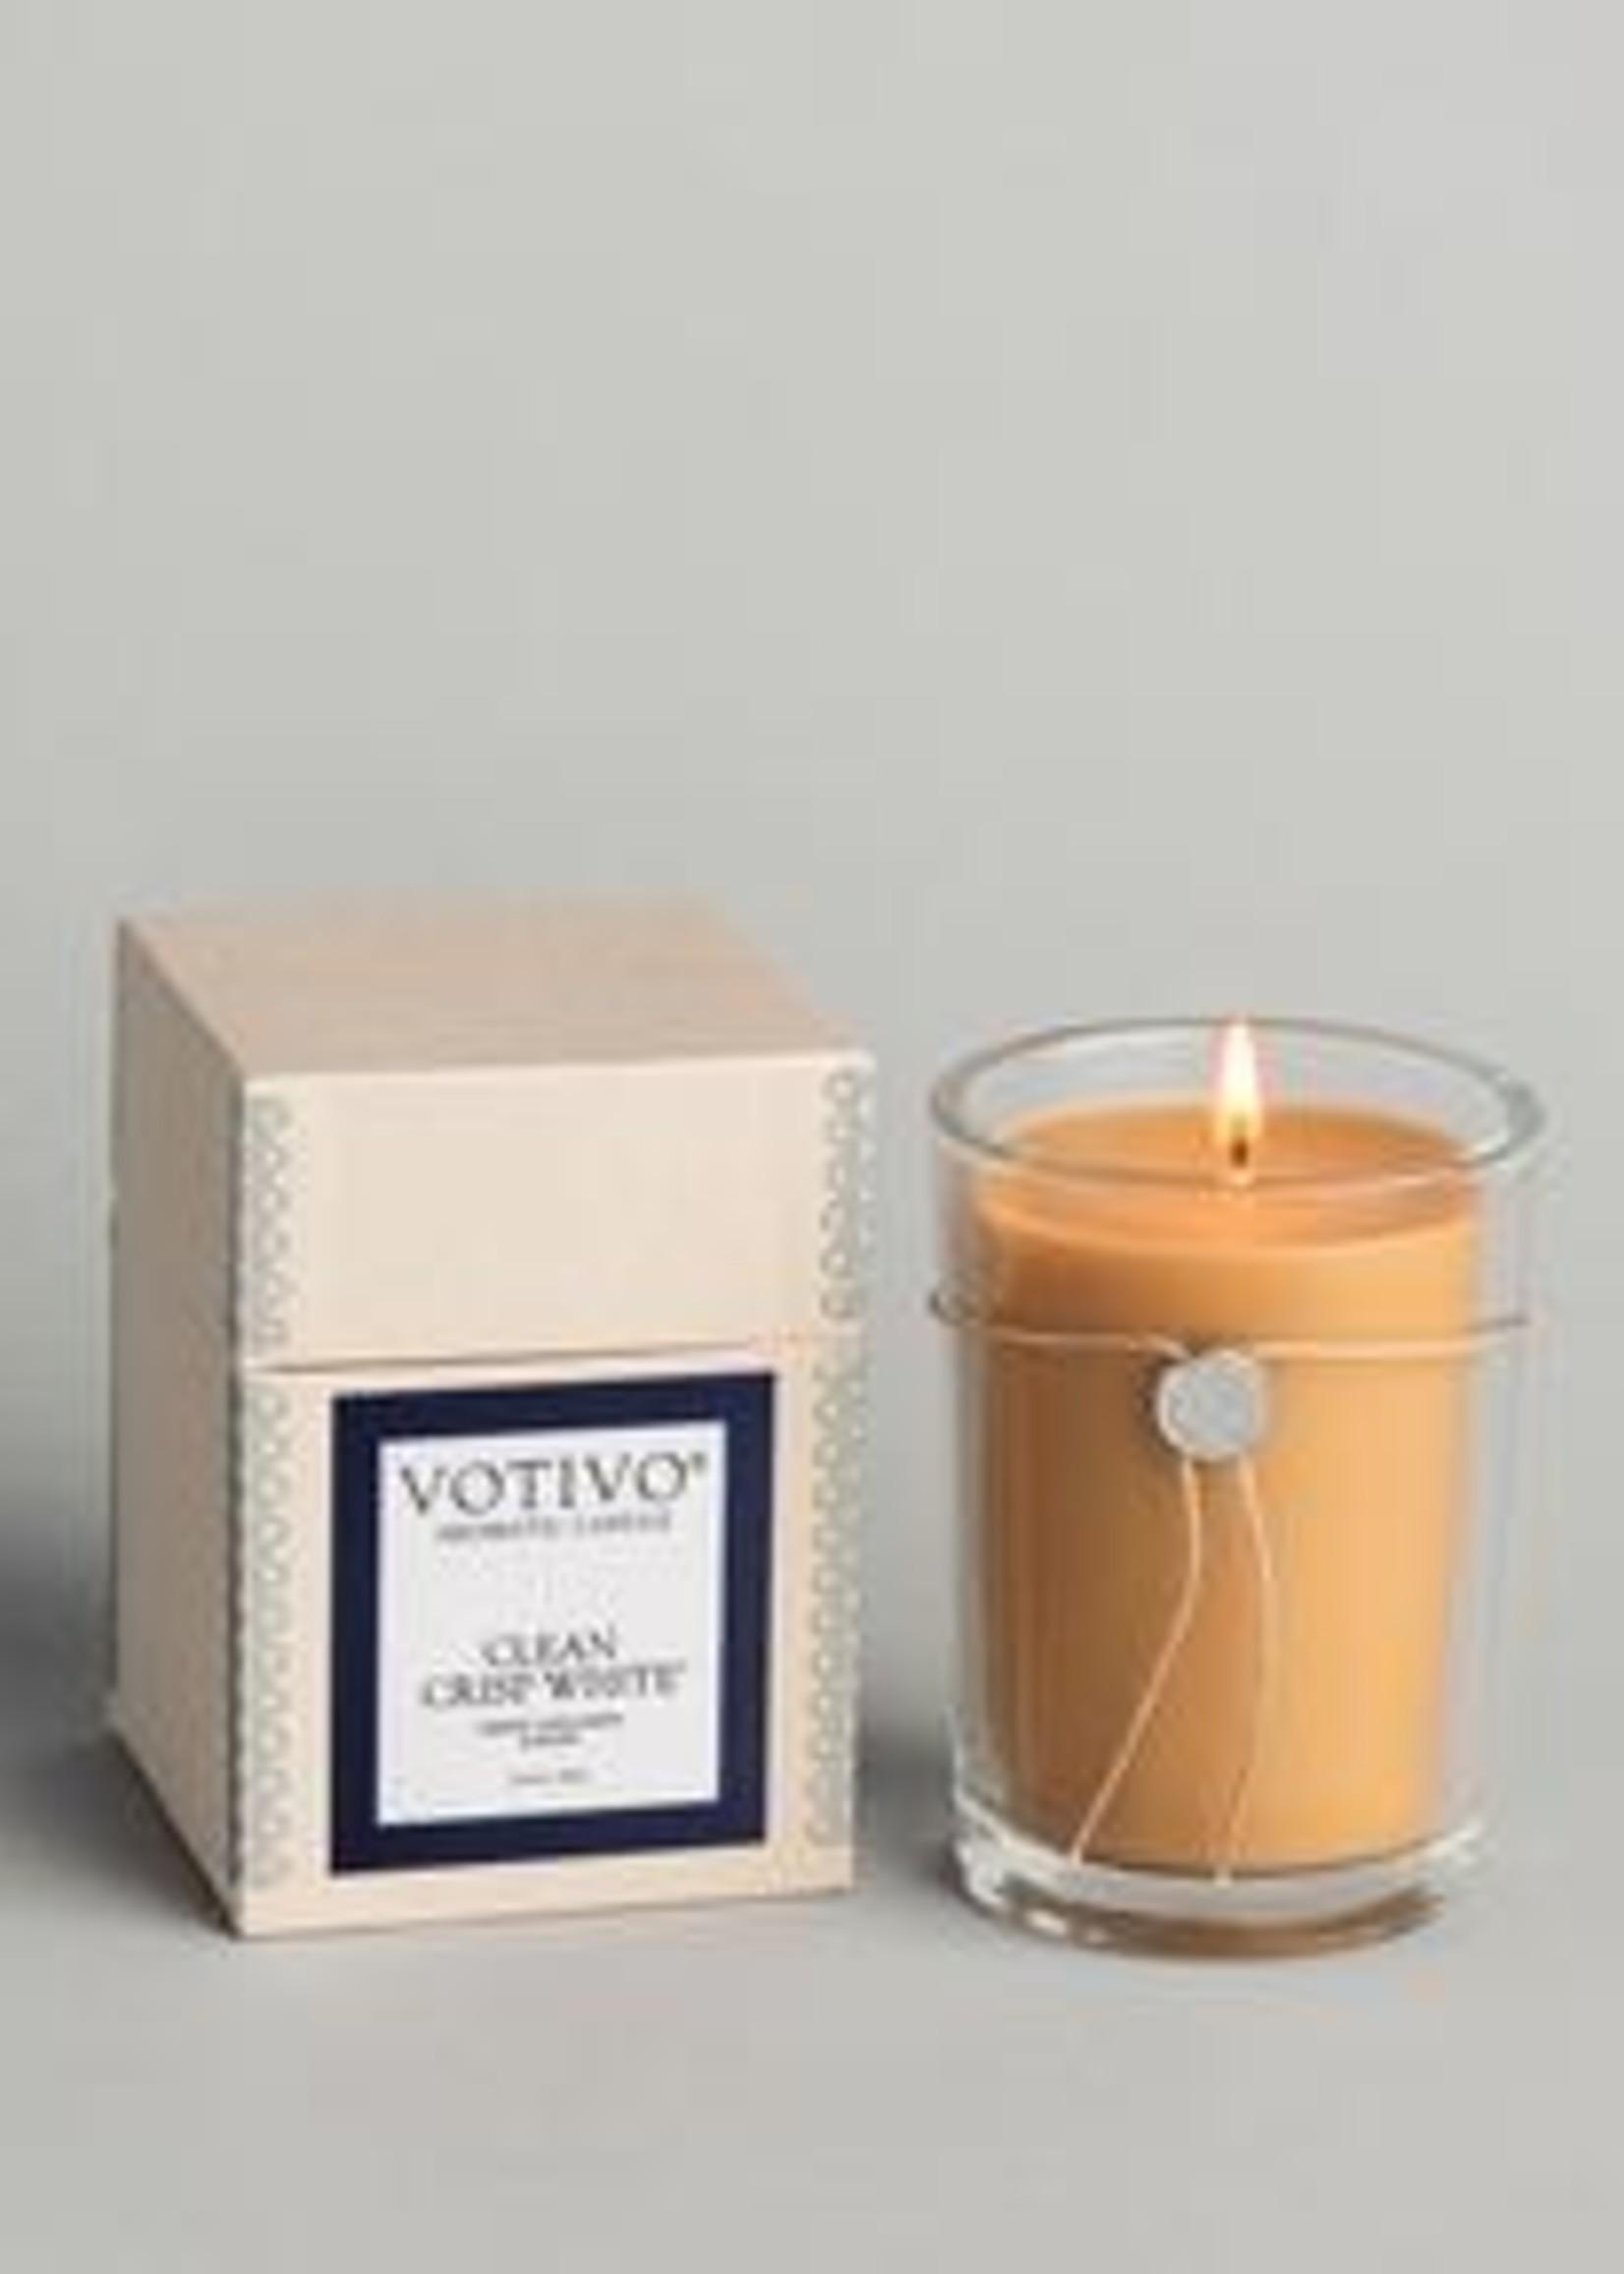 Votivo Ltd Votivo Aromatic Candle